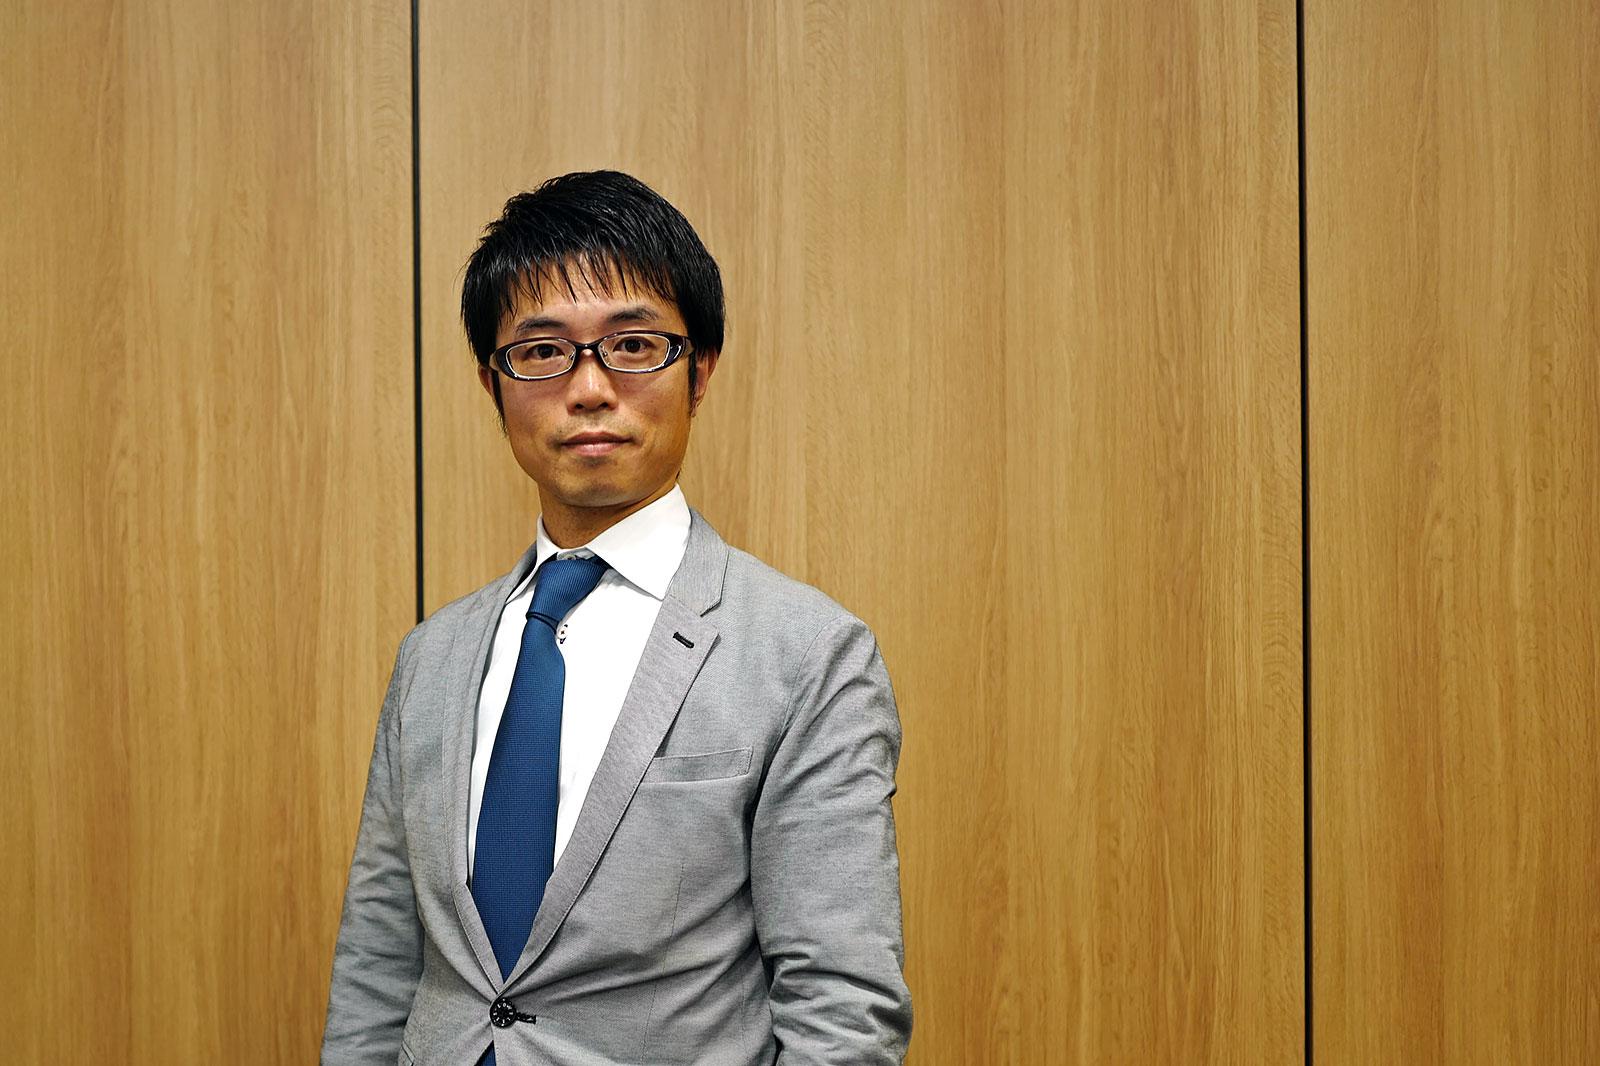 Shinichiro Kubo Grand Seiko designer